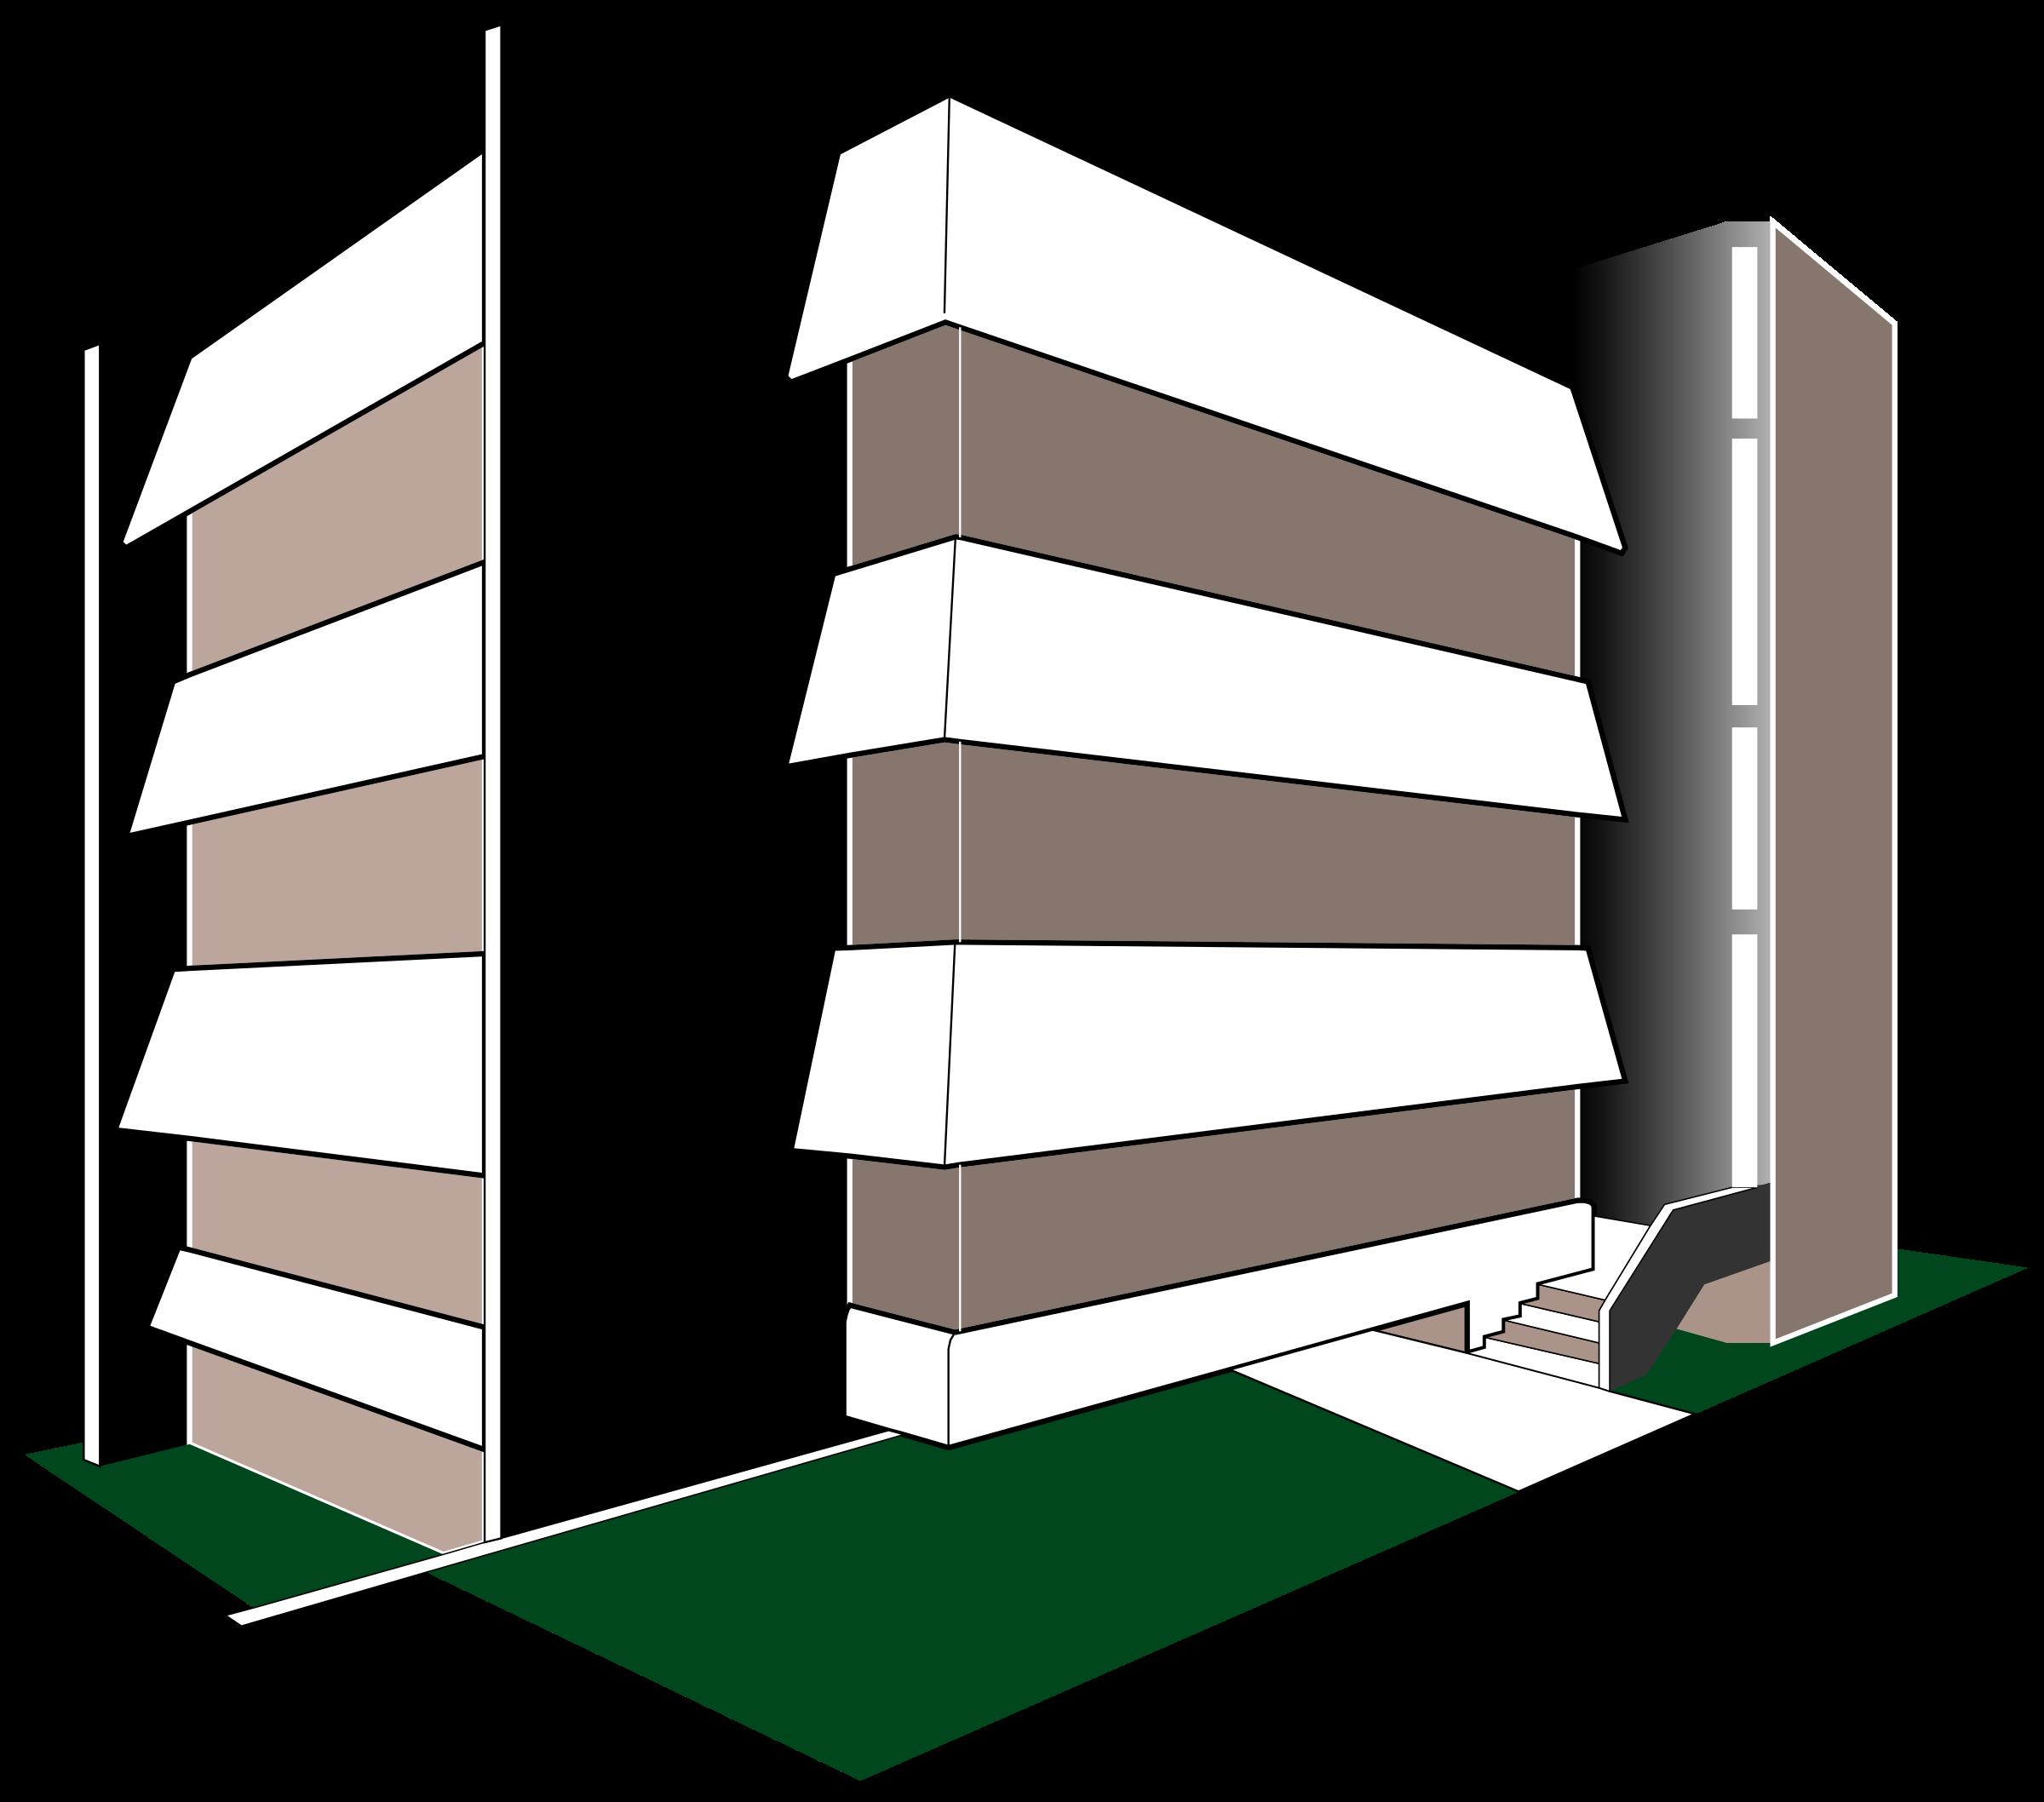 Clipart - modern multi-level parking garage jpg